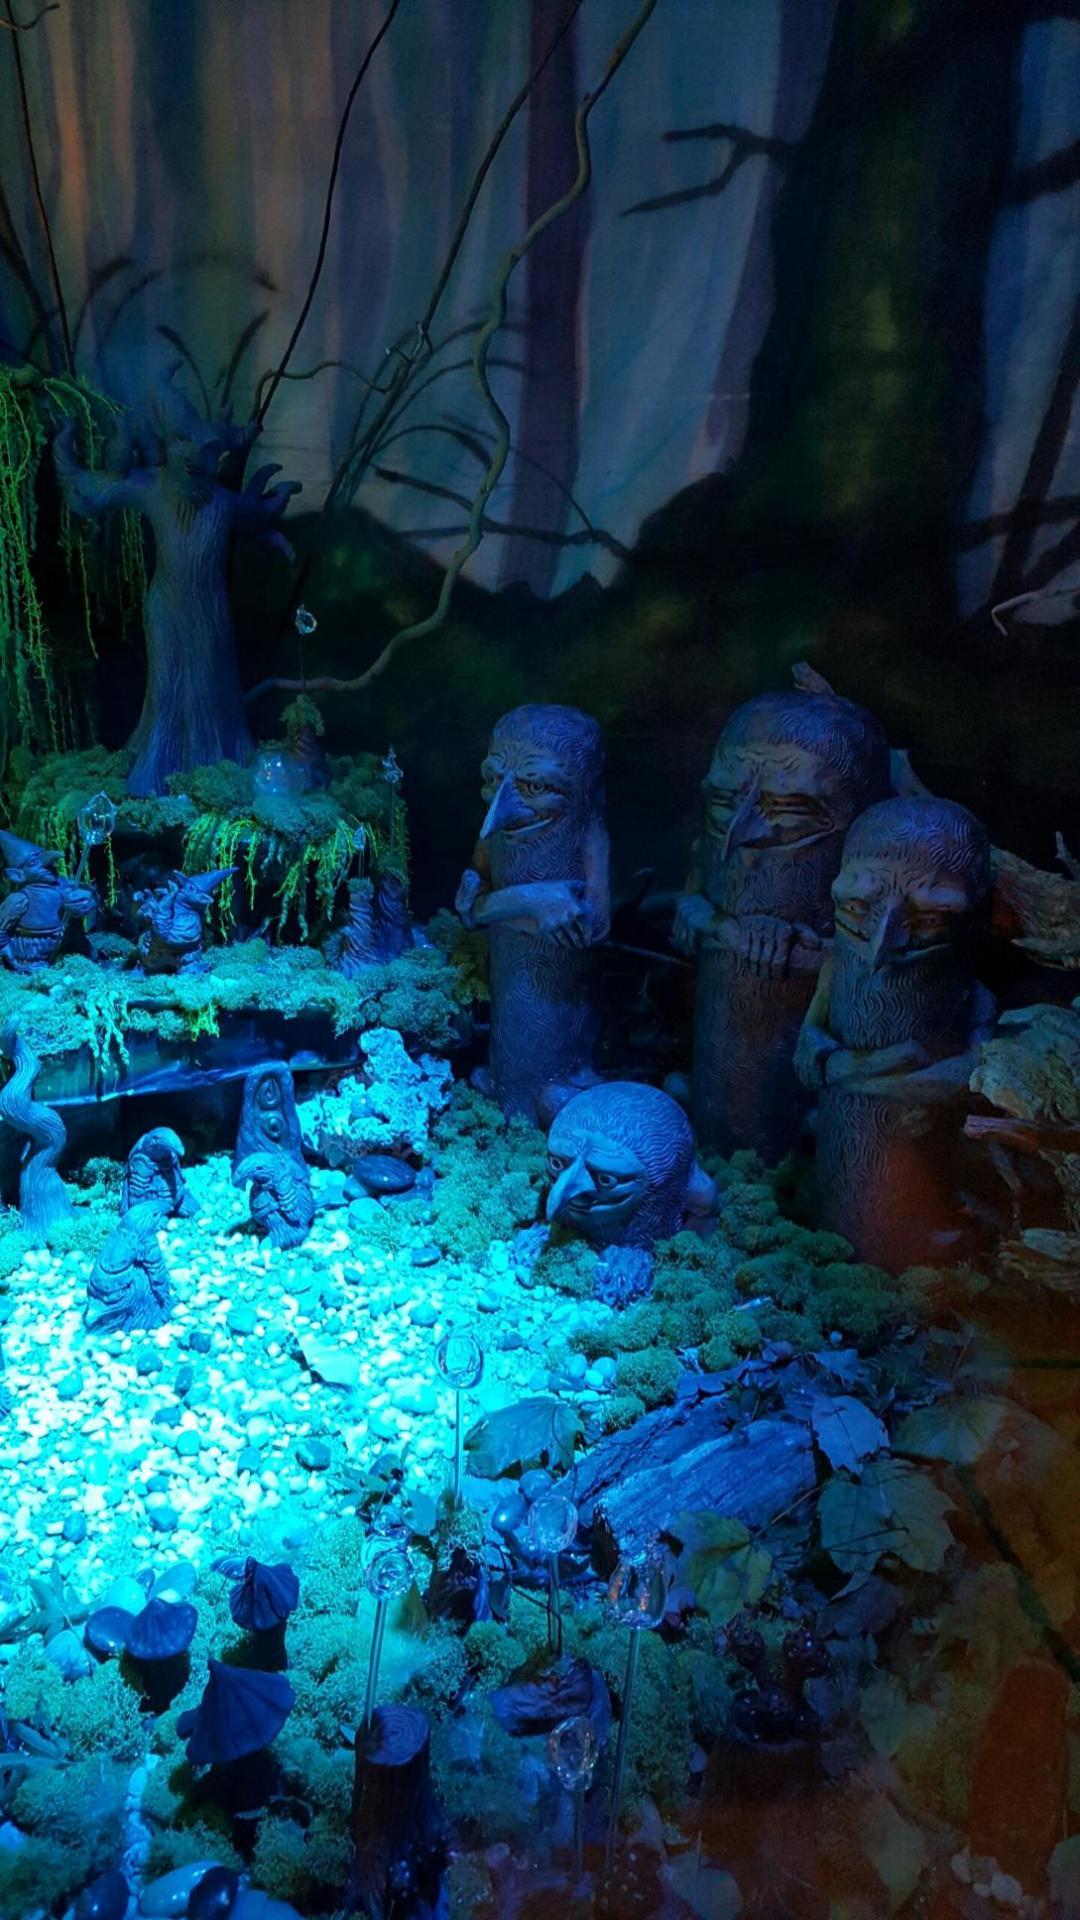 diorama, fantasy sculpture, window diorama, window display, fantasy realm, handmade pottery, by zack rudy, by cindi hardwicke